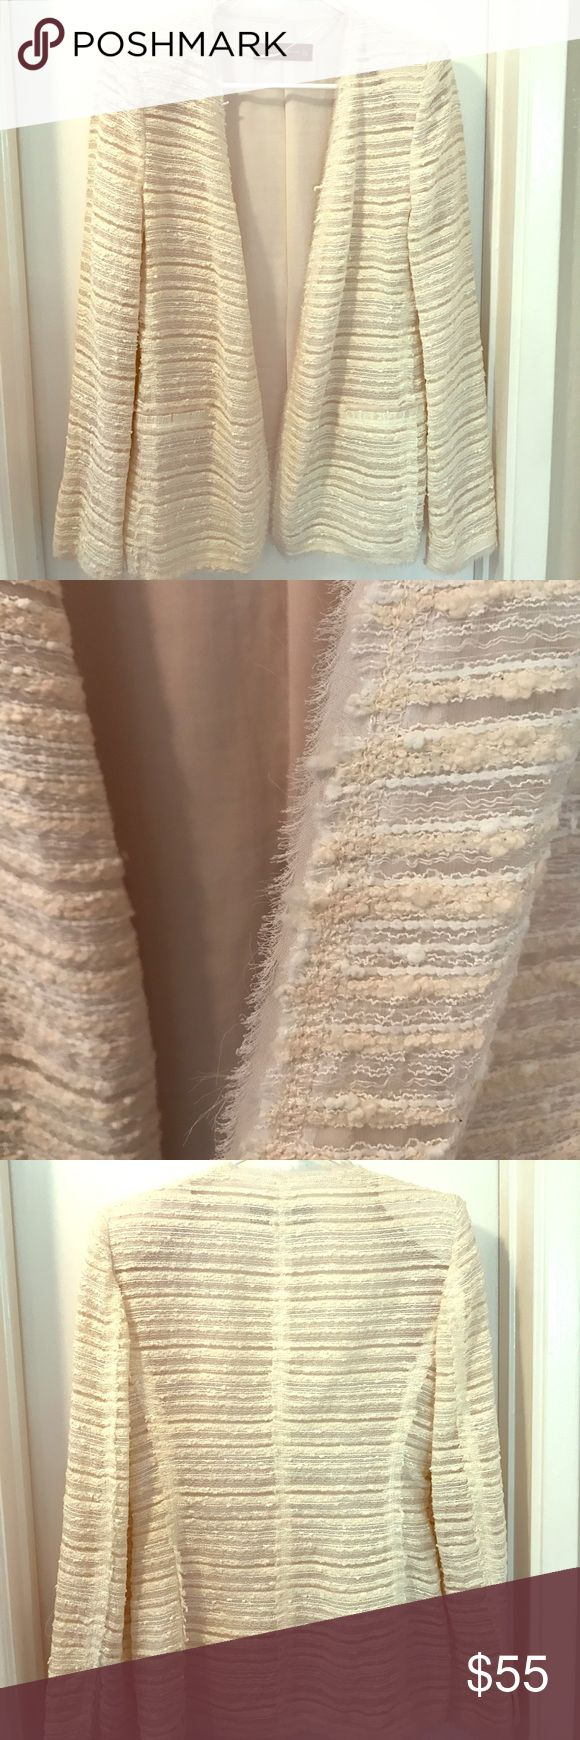 Zara jacket Cream/white Zara open jacket. Does not close, has small shoulder pads to provide shape. Falls just above the waist when worn. Zara Jackets & Coats